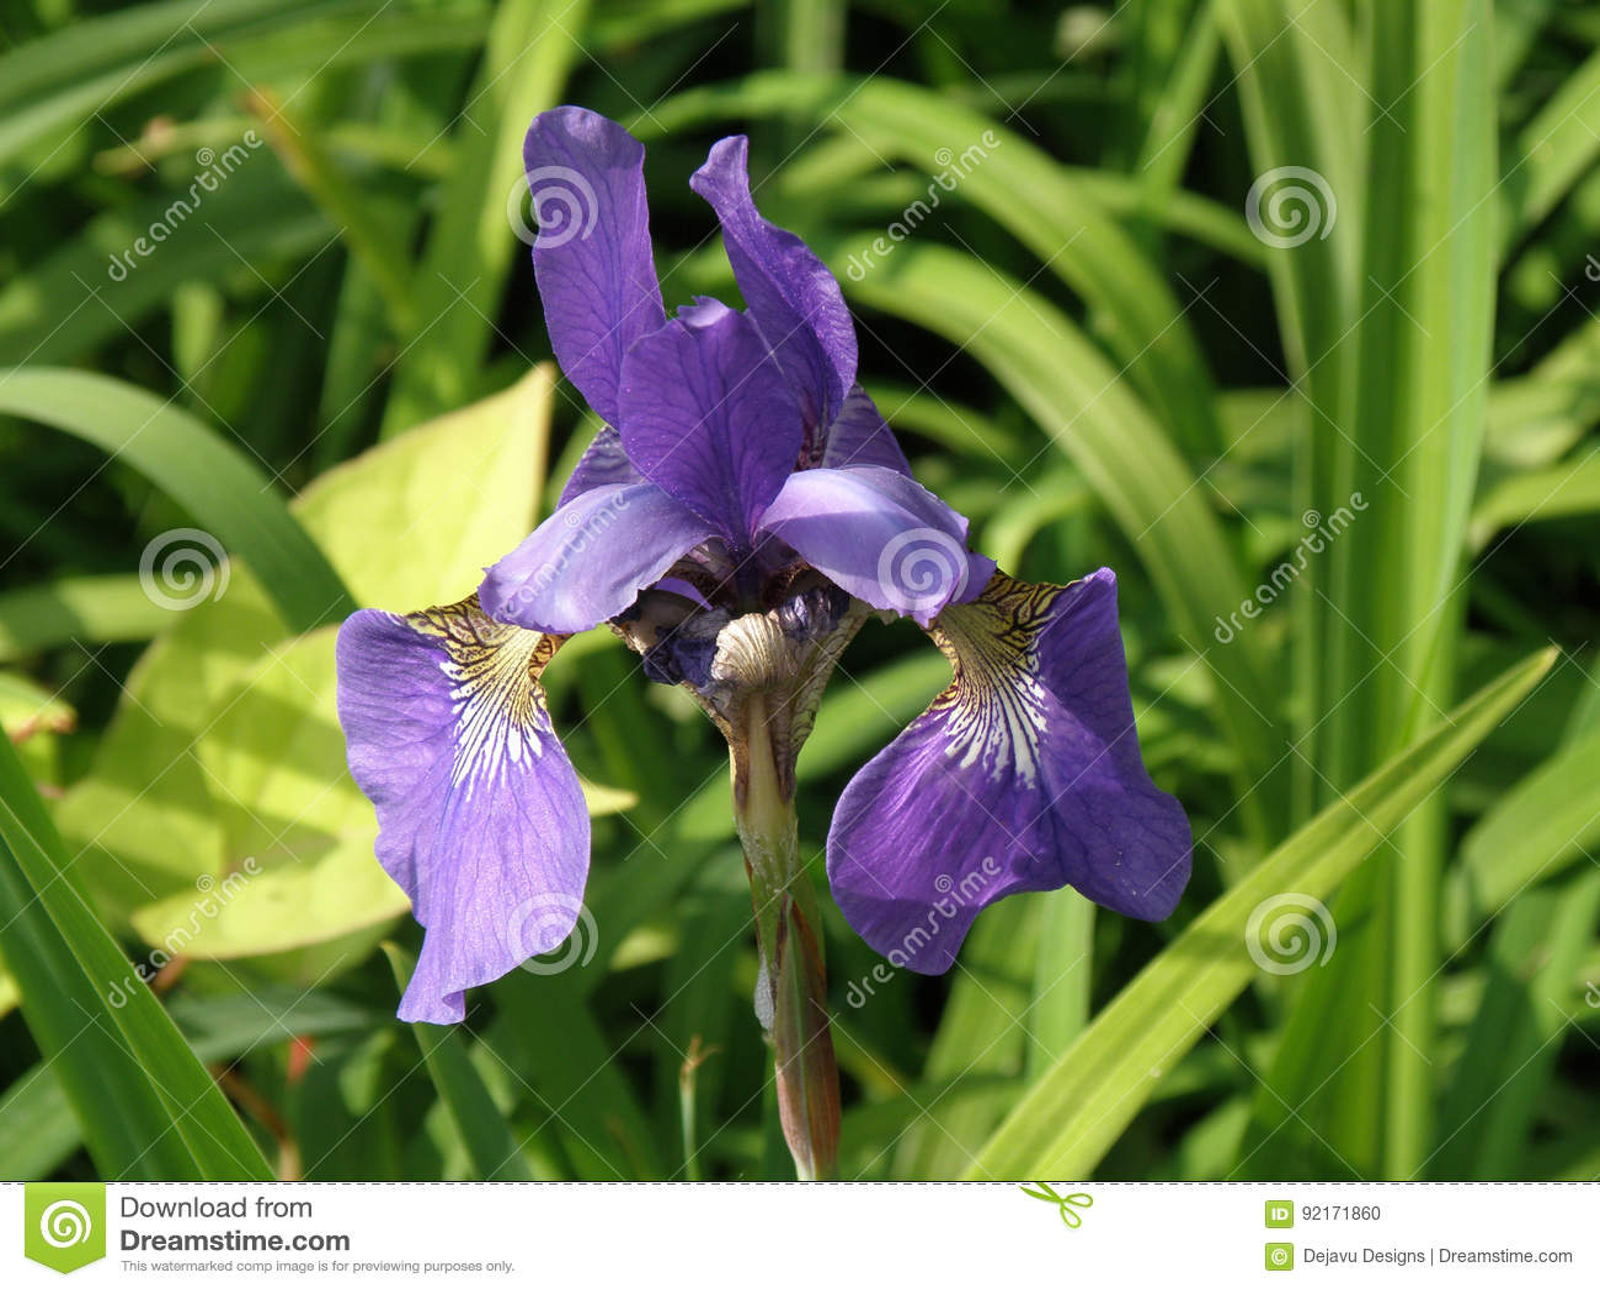 Gorgeous blooming siberian iris flower blossom flowering stock photo gorgeous blooming siberian iris flower blossom flowering izmirmasajfo